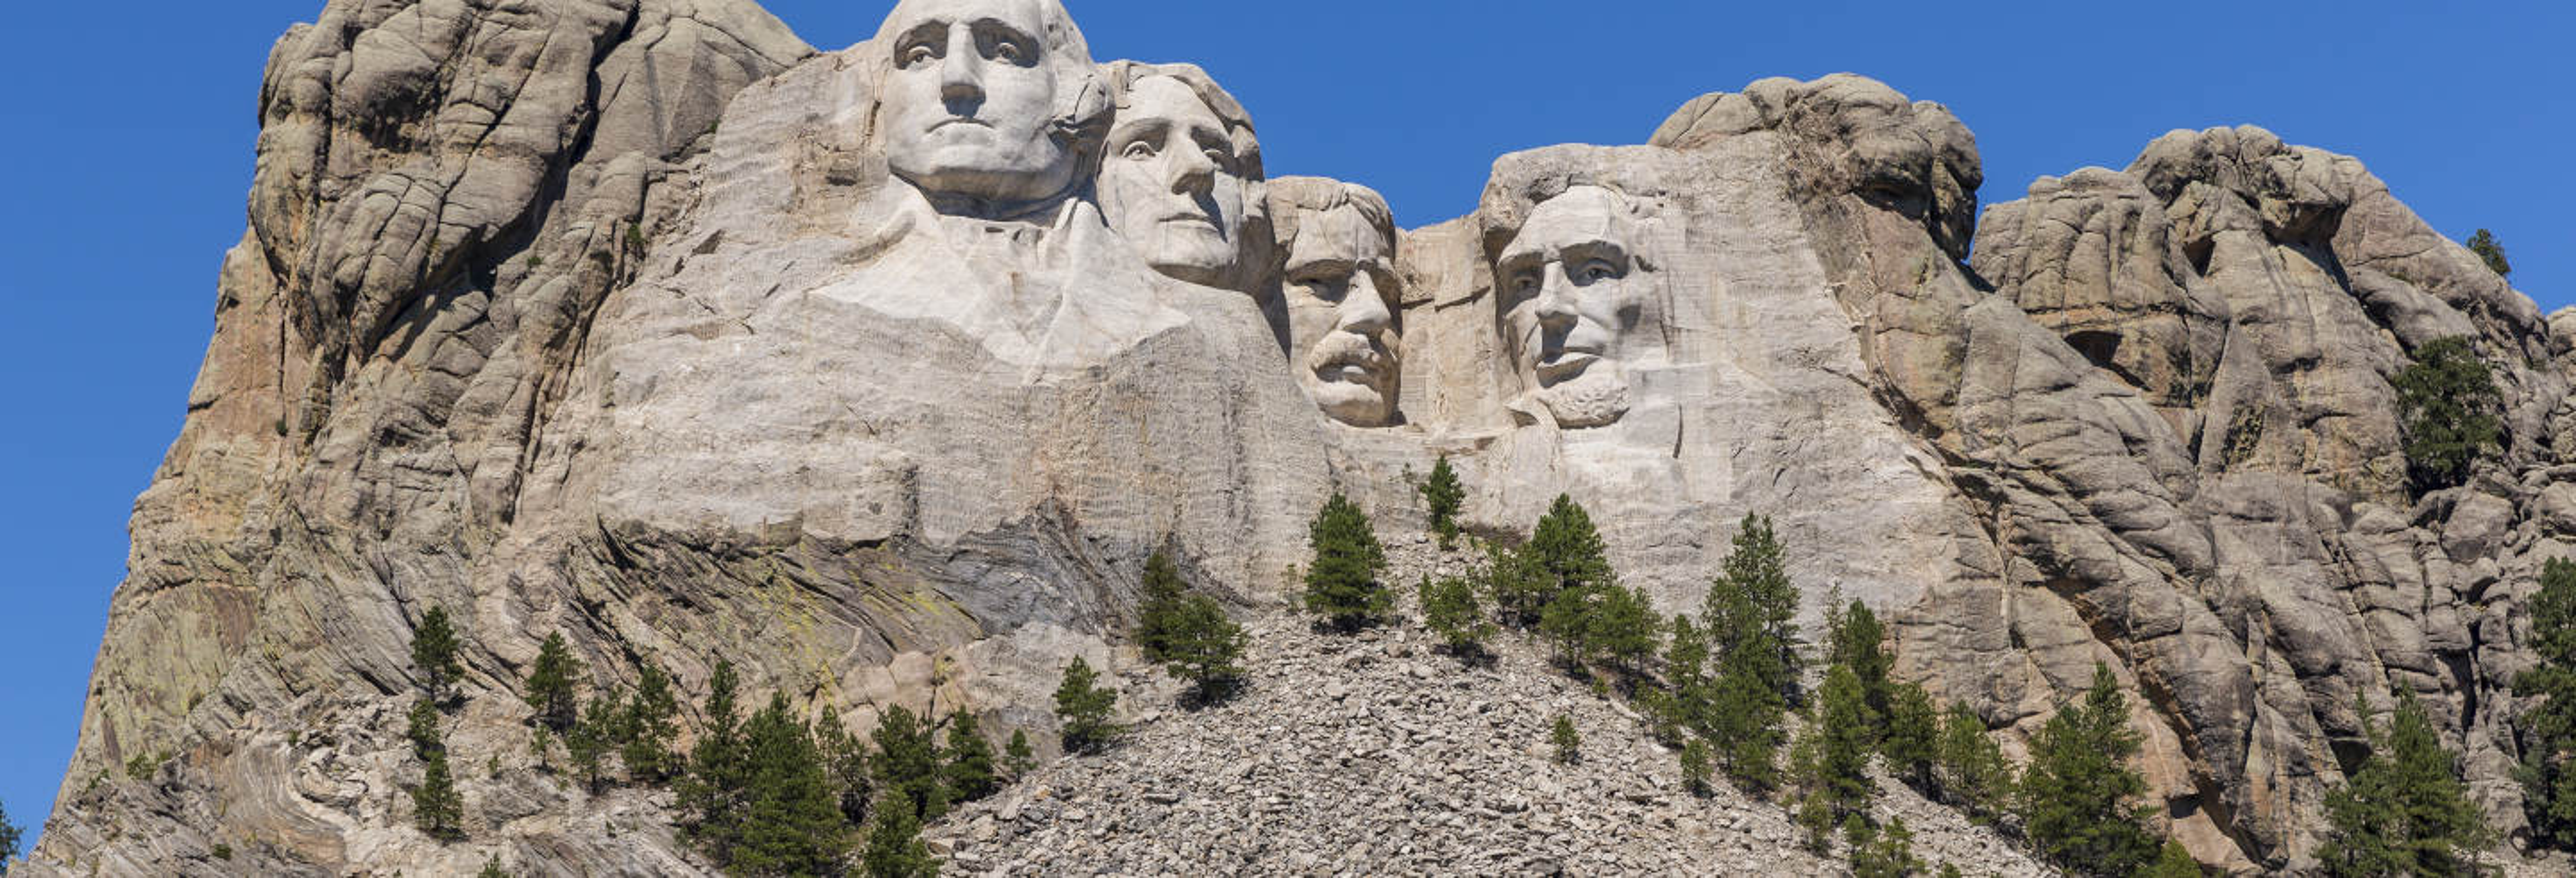 Mount Rushmore Day Trip